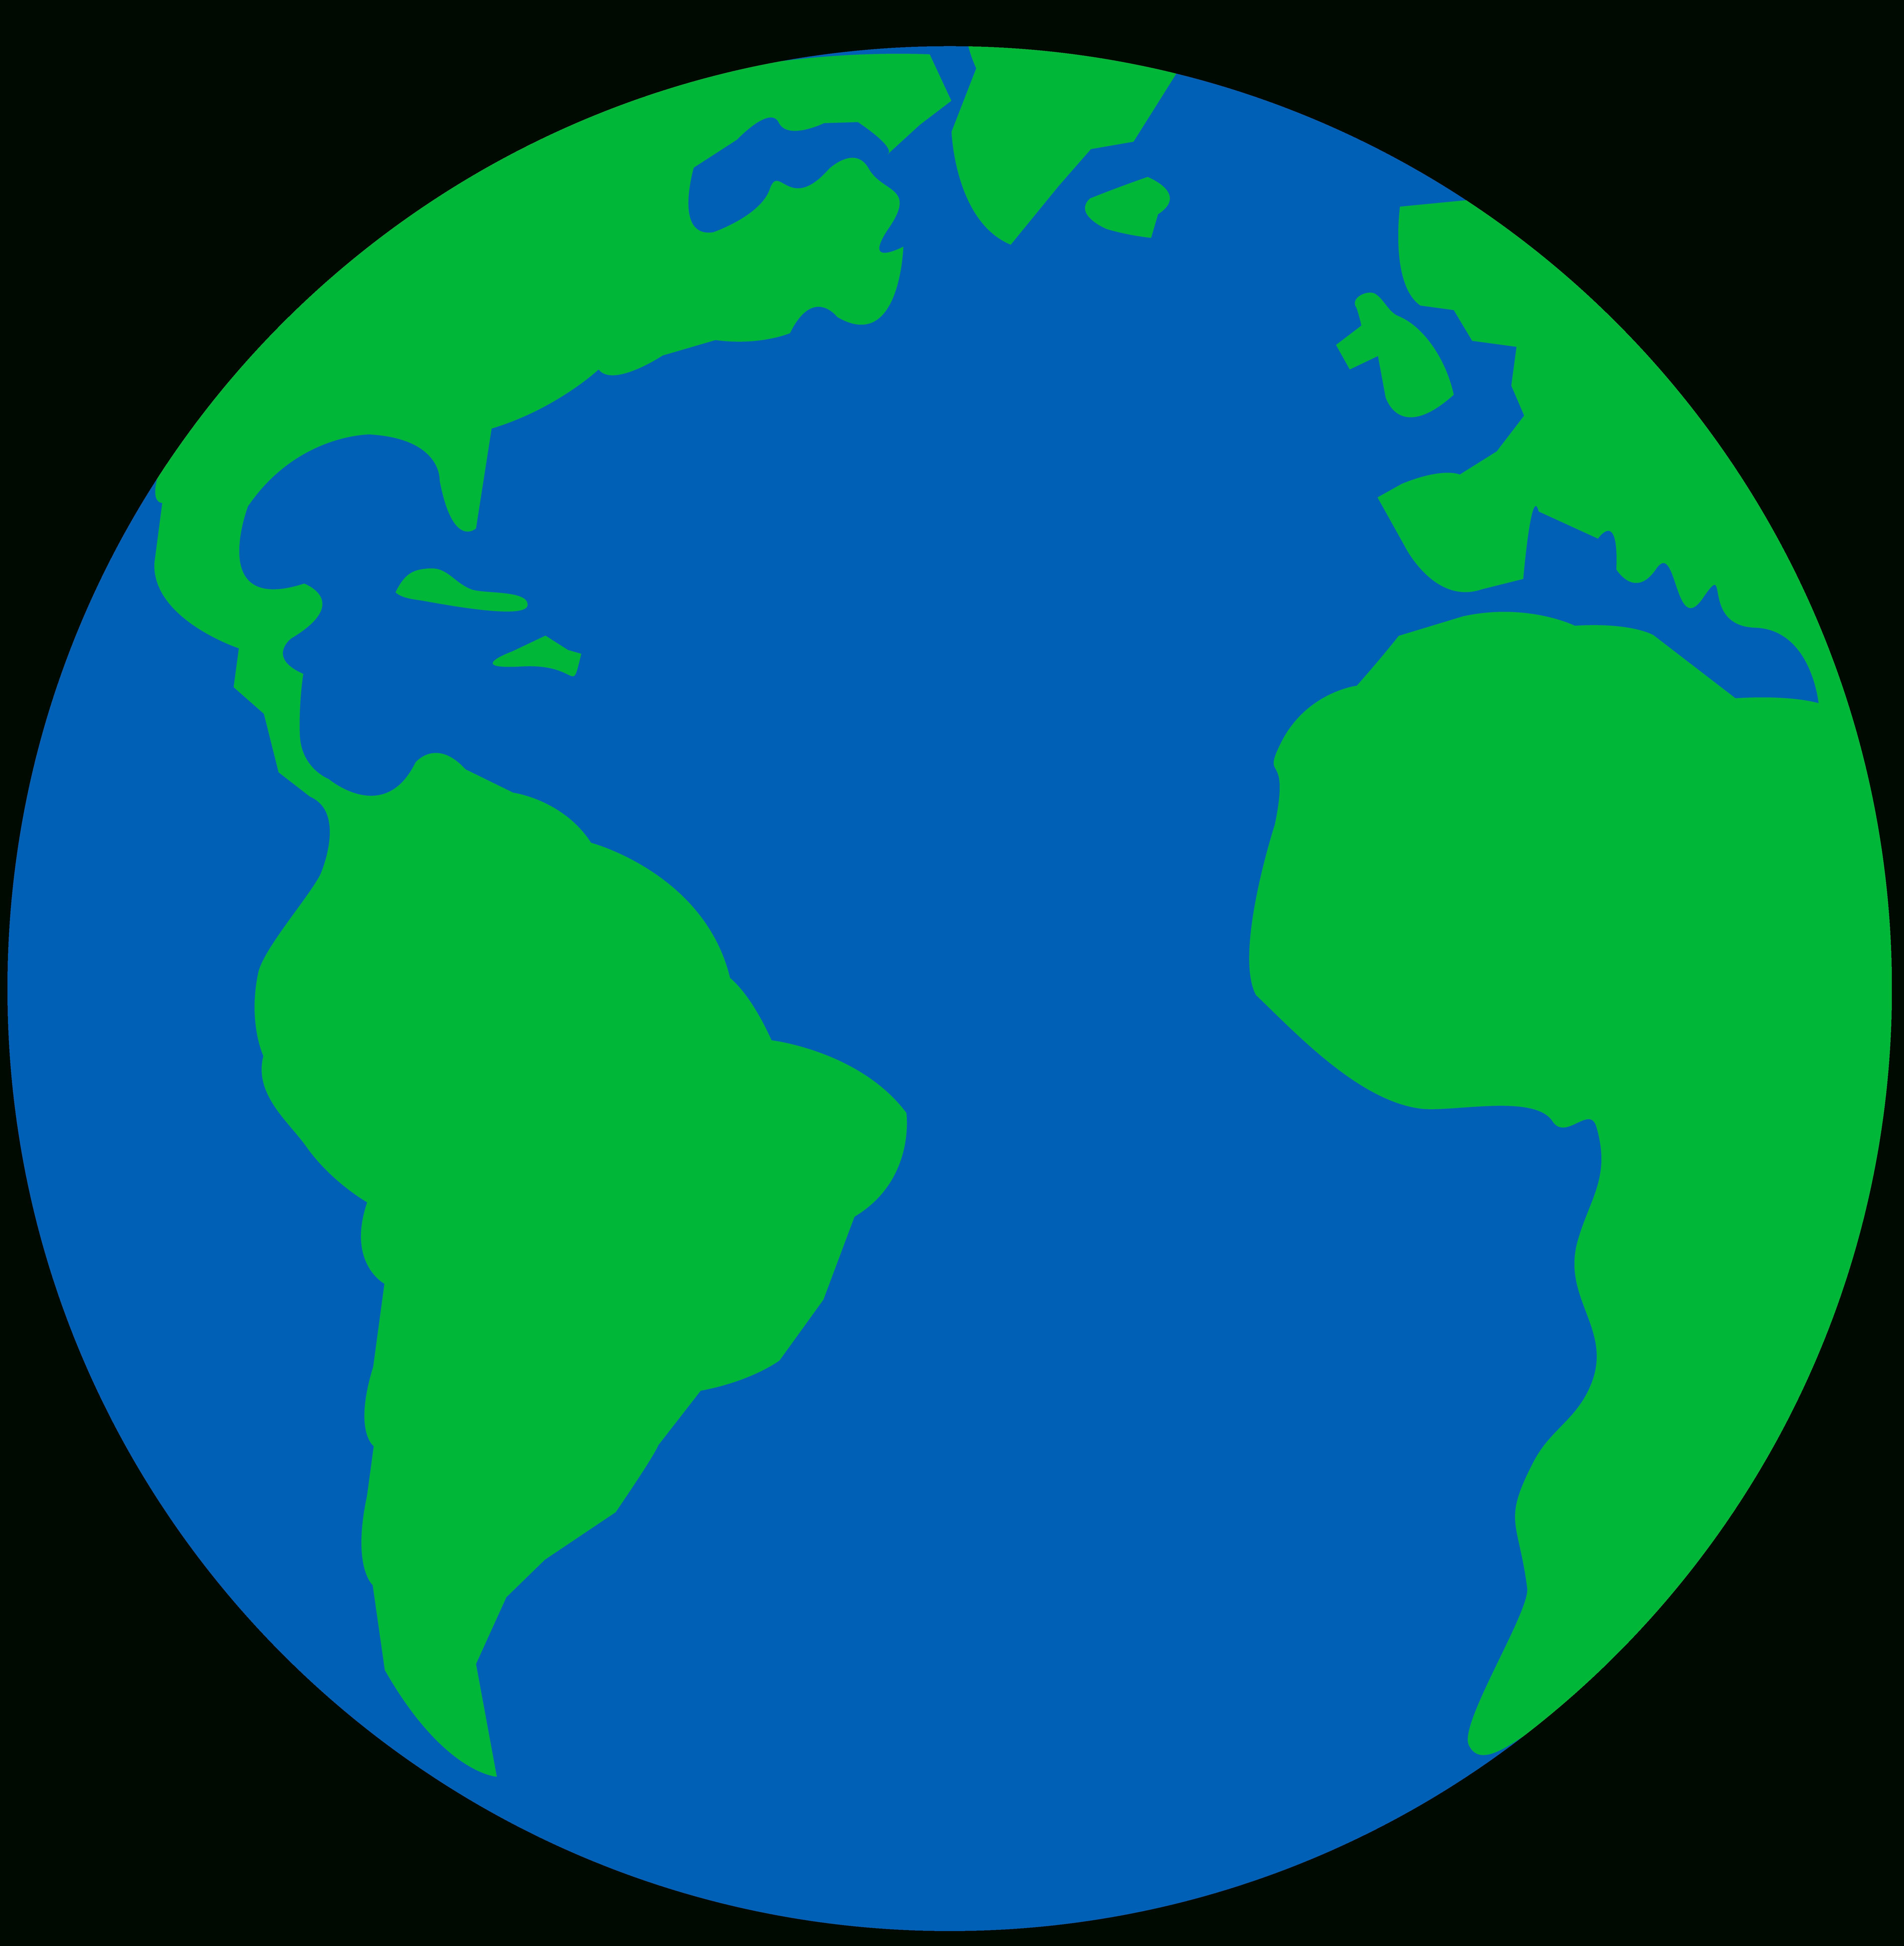 7647x7814 Cartoon Earth Drawing Earth Cartoon Drawing Earth Drawing Images